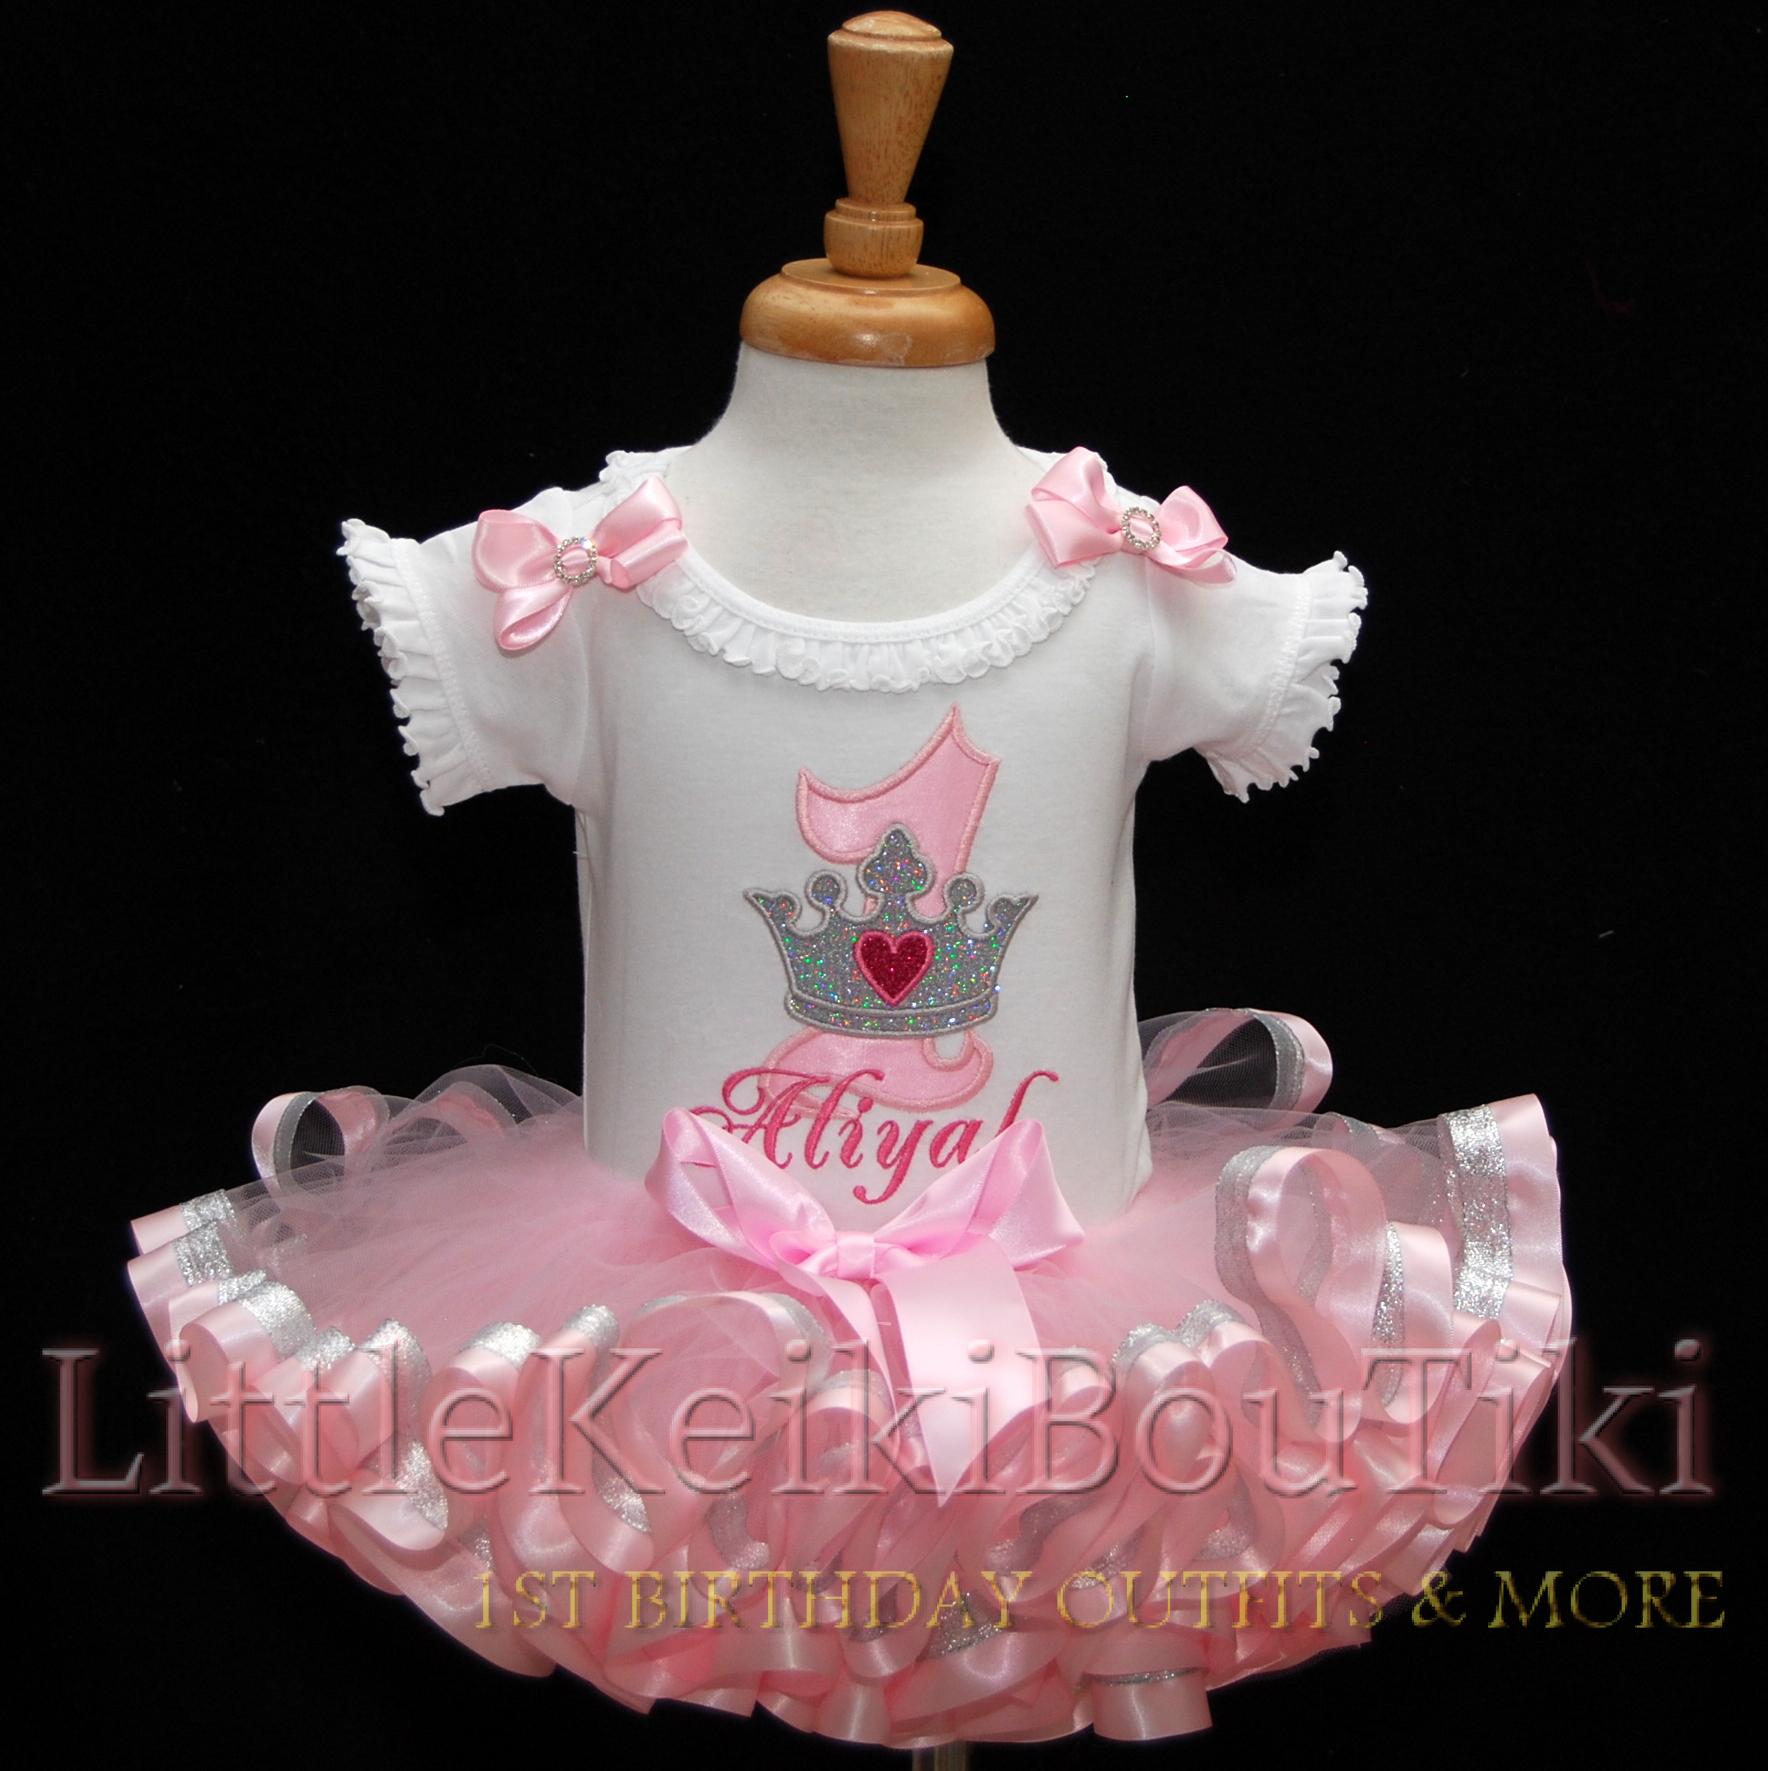 Princess 1st Birthday Outfit, Customized Onesie, 6 piece set